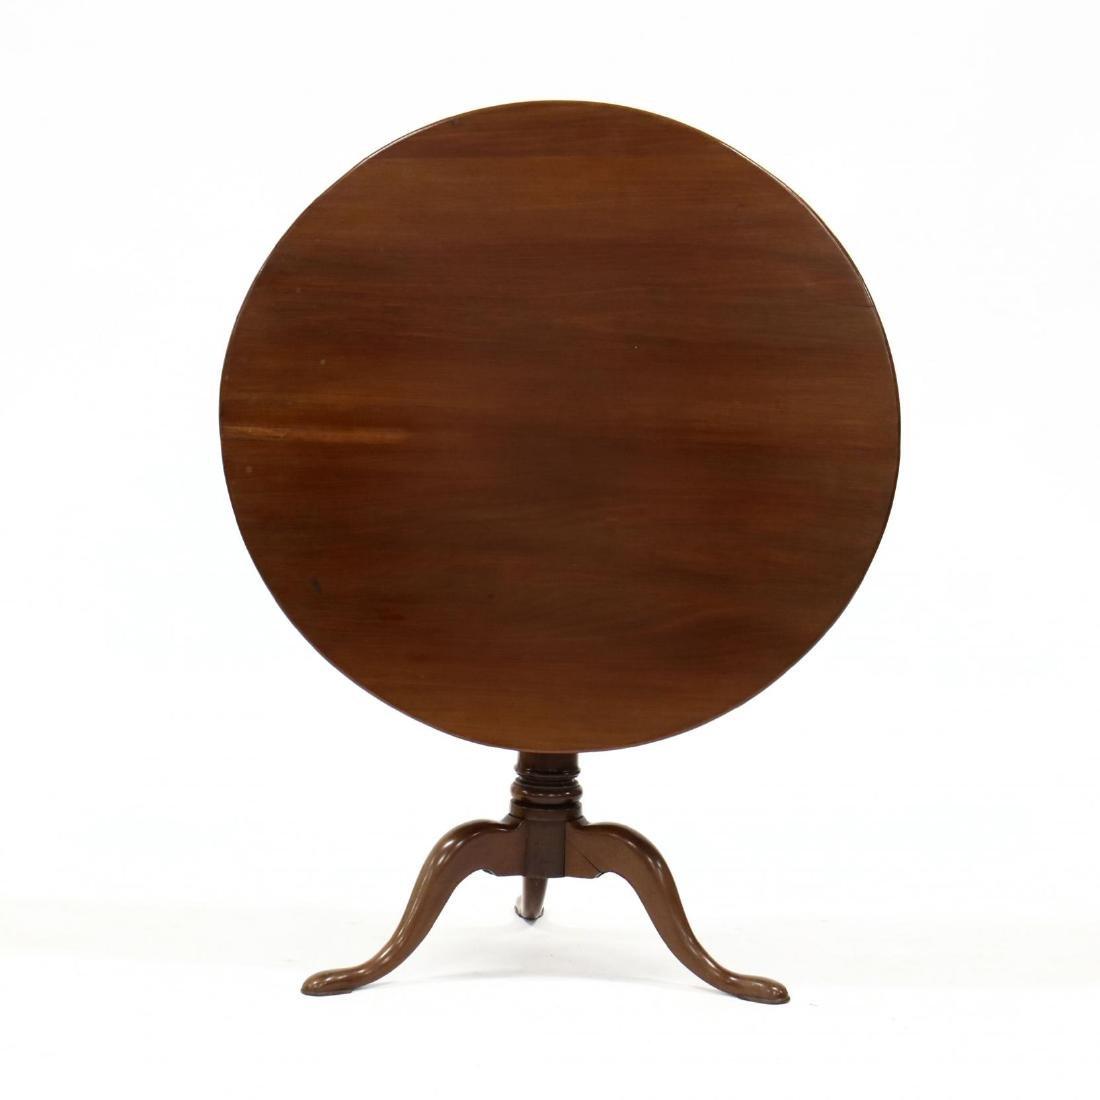 American Queen Anne Mahogany Tilt Top Tea Table - 2